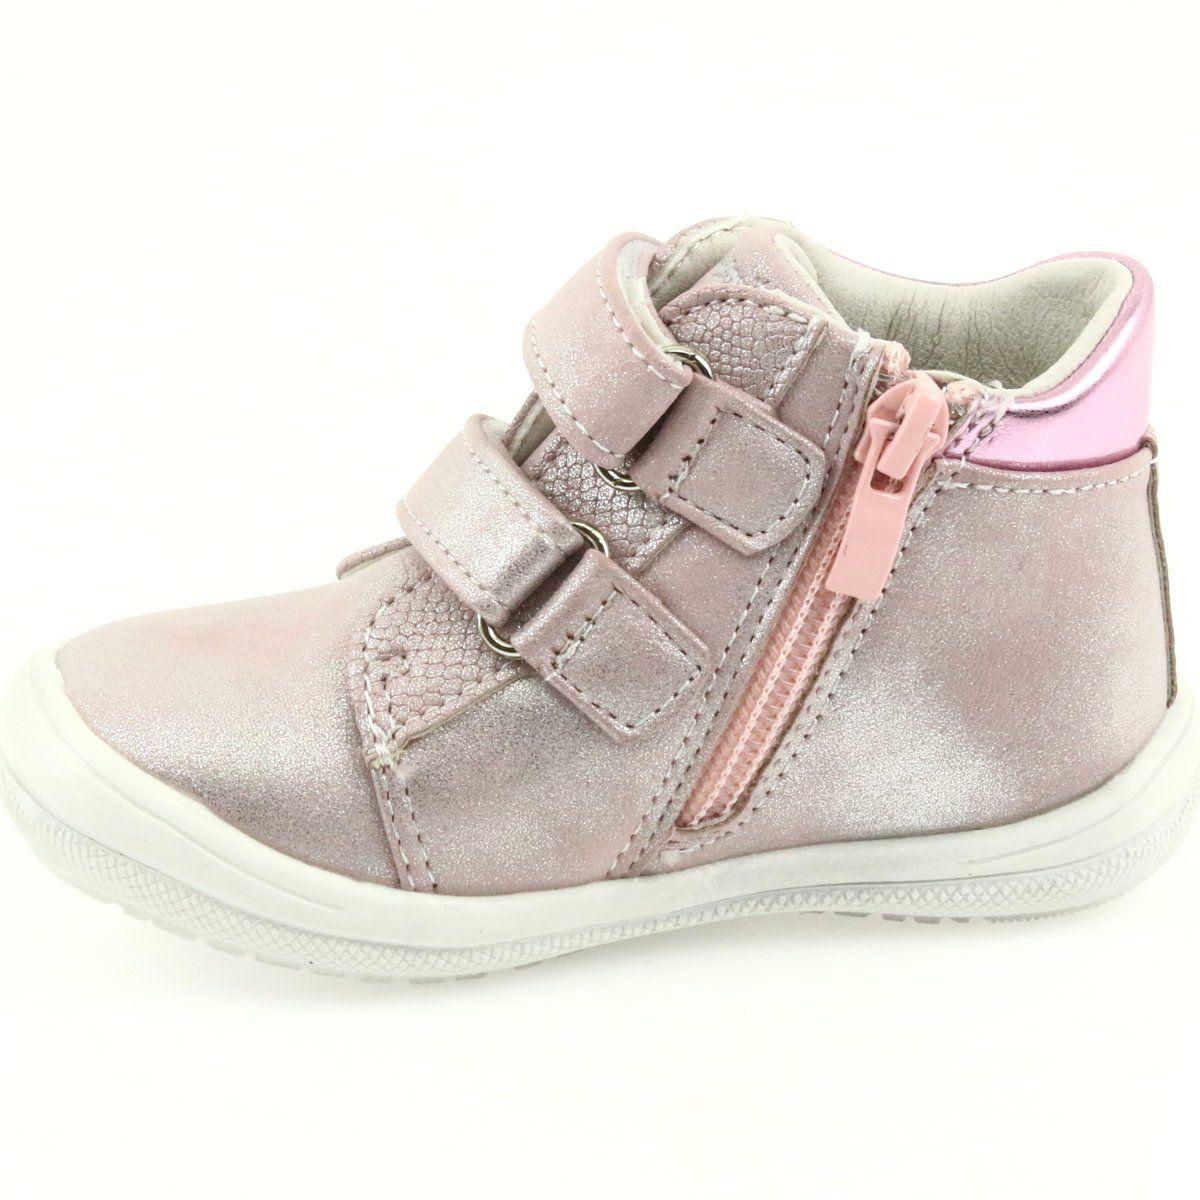 American Club Adi Sportowe Buty Dzieciece W Serduszka American Szare Rozowe Wedge Sneaker Shoes Sneakers